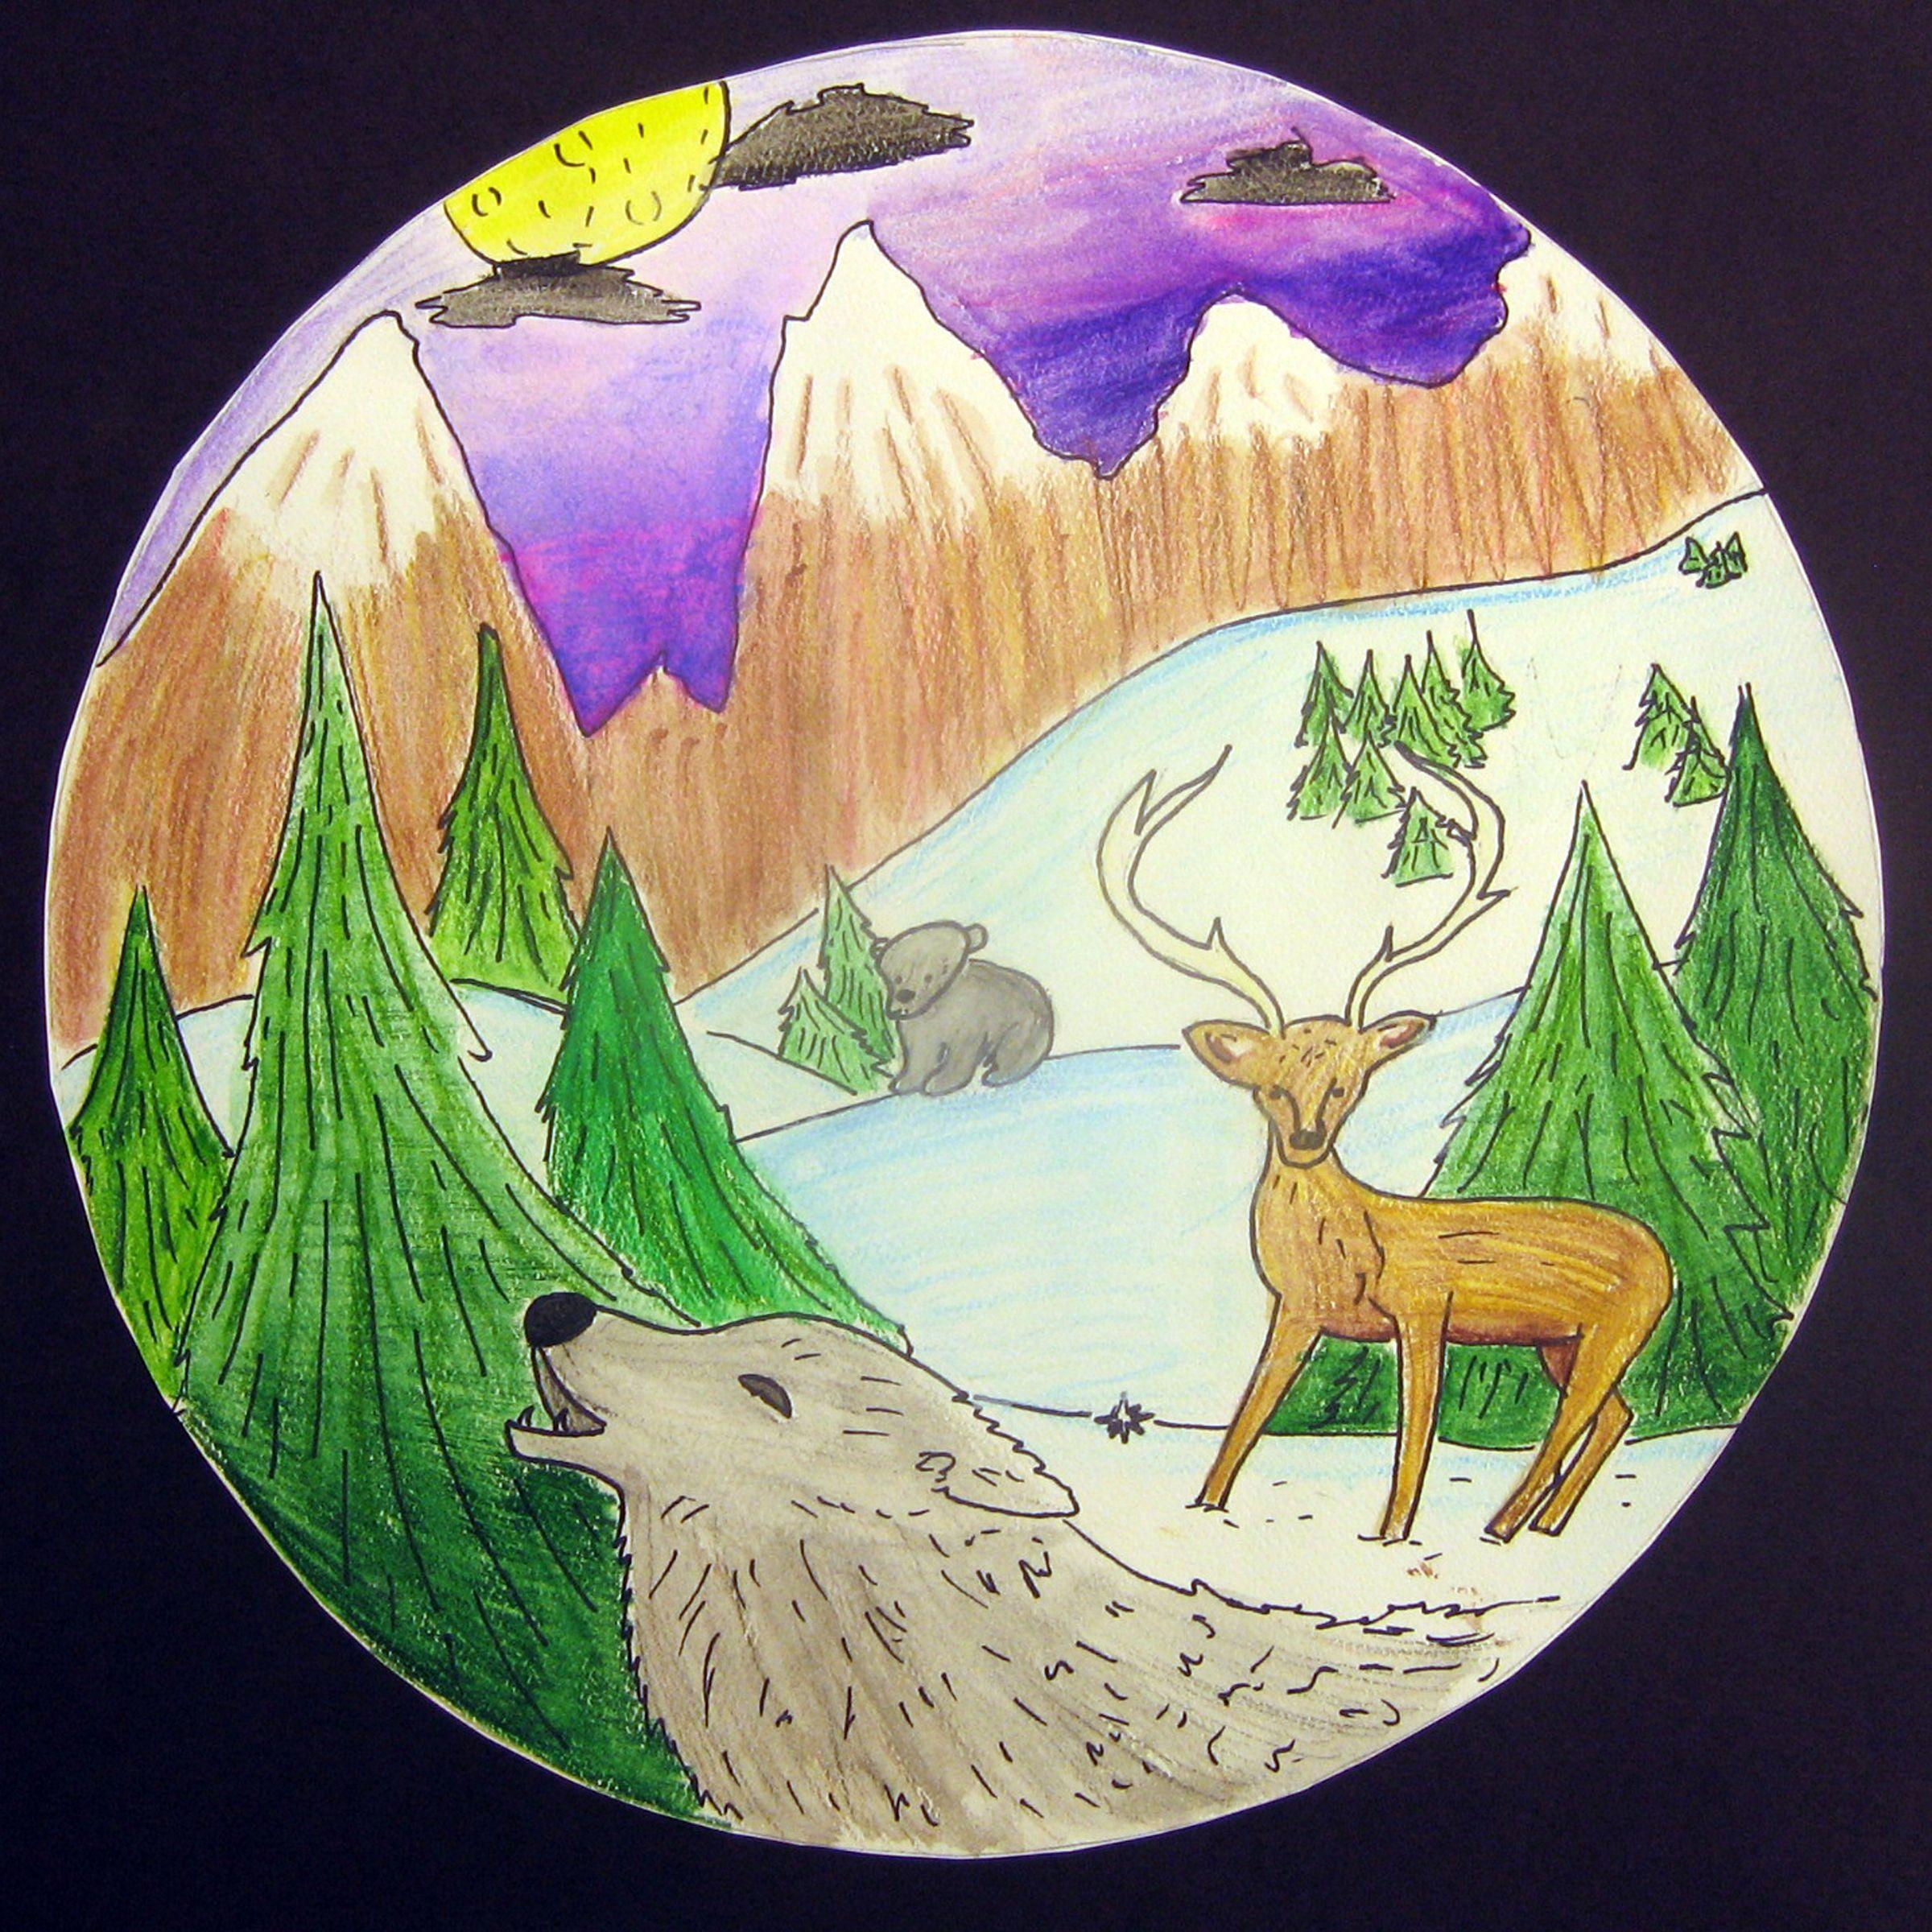 Biome Illustrations Biomes Illustration Forest Art [ 2400 x 2400 Pixel ]